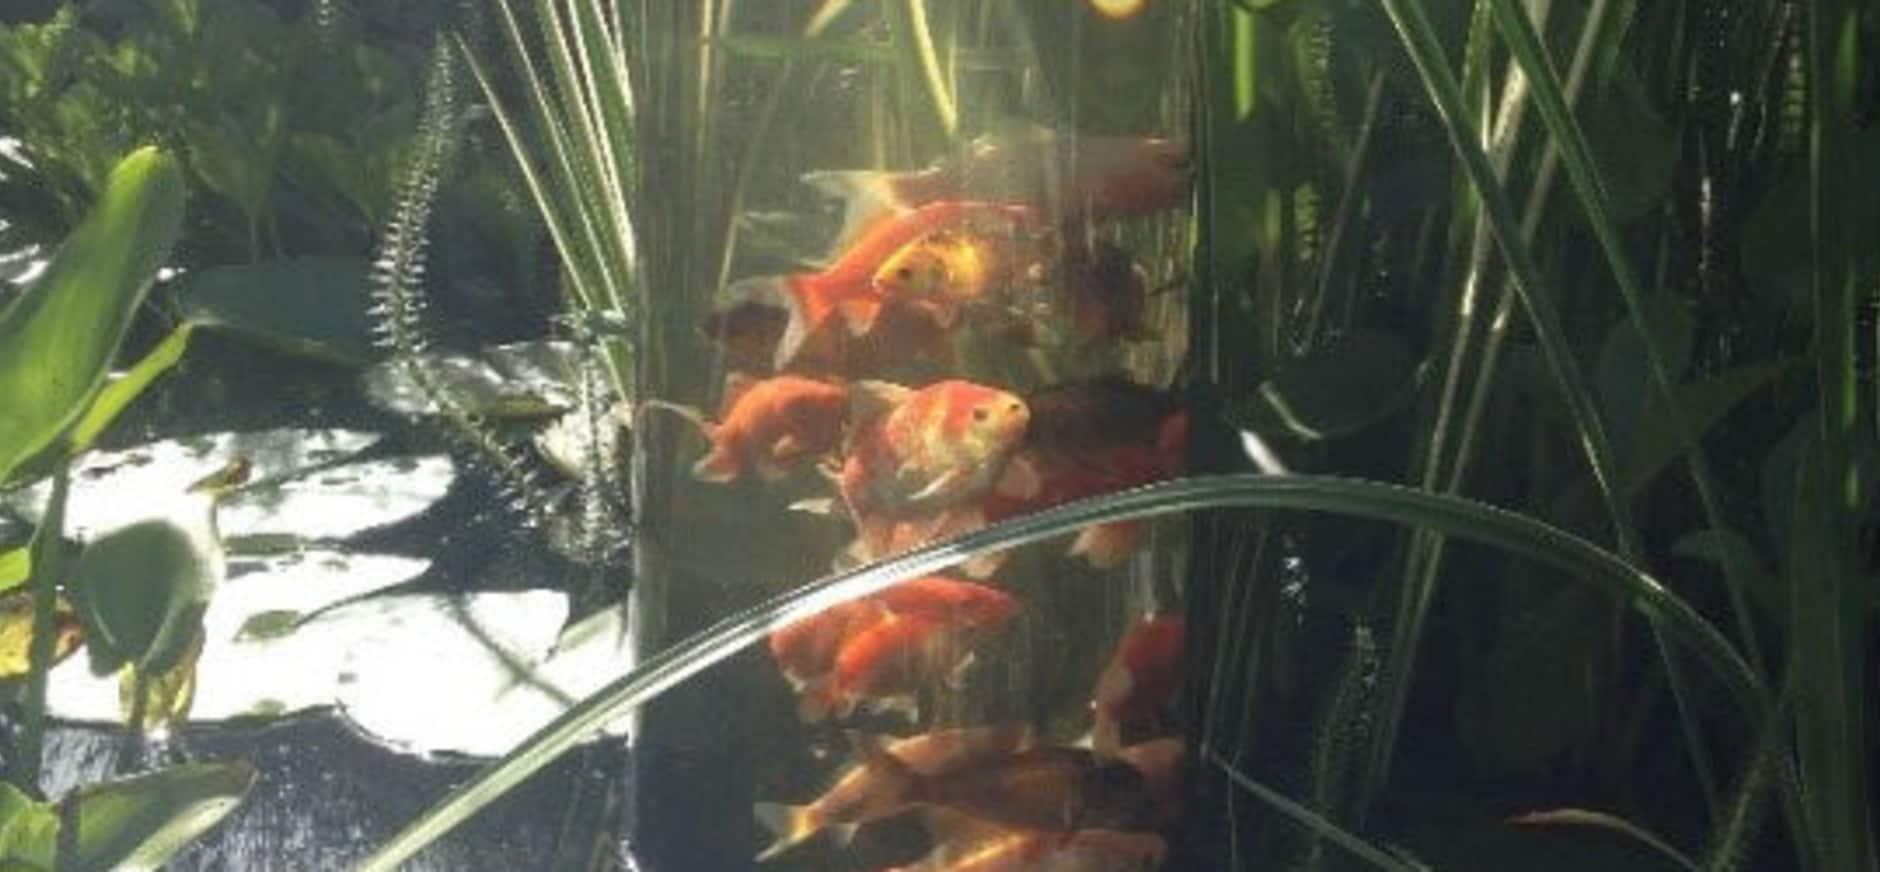 Spannende onderwaternatuur zichtbaar met vis-cilinder